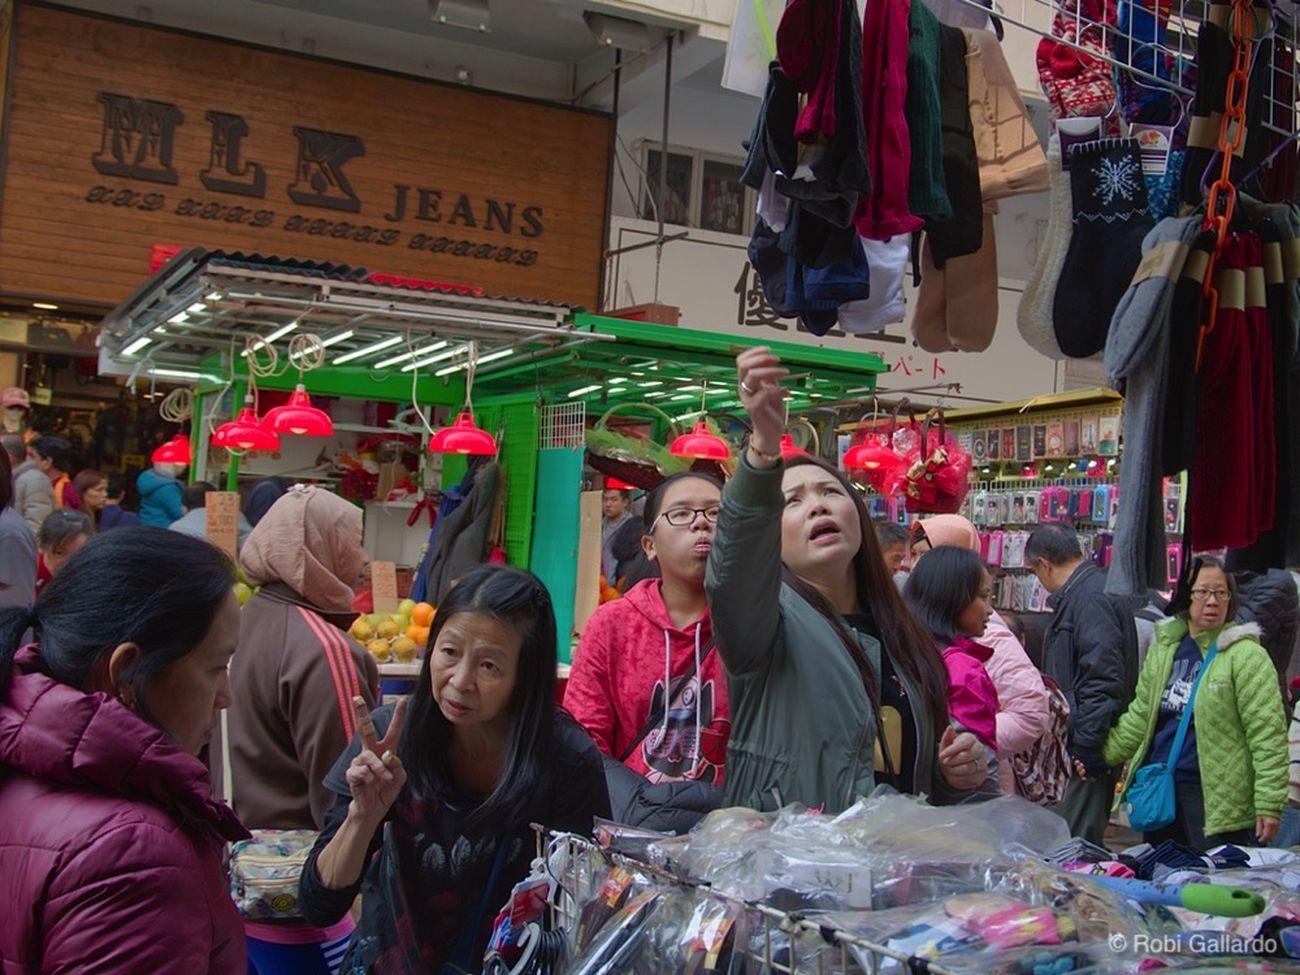 City DSLR Dslrphotography Hong Kong Outdoors Pentax People Street Market Streetphotography Women Street Real People